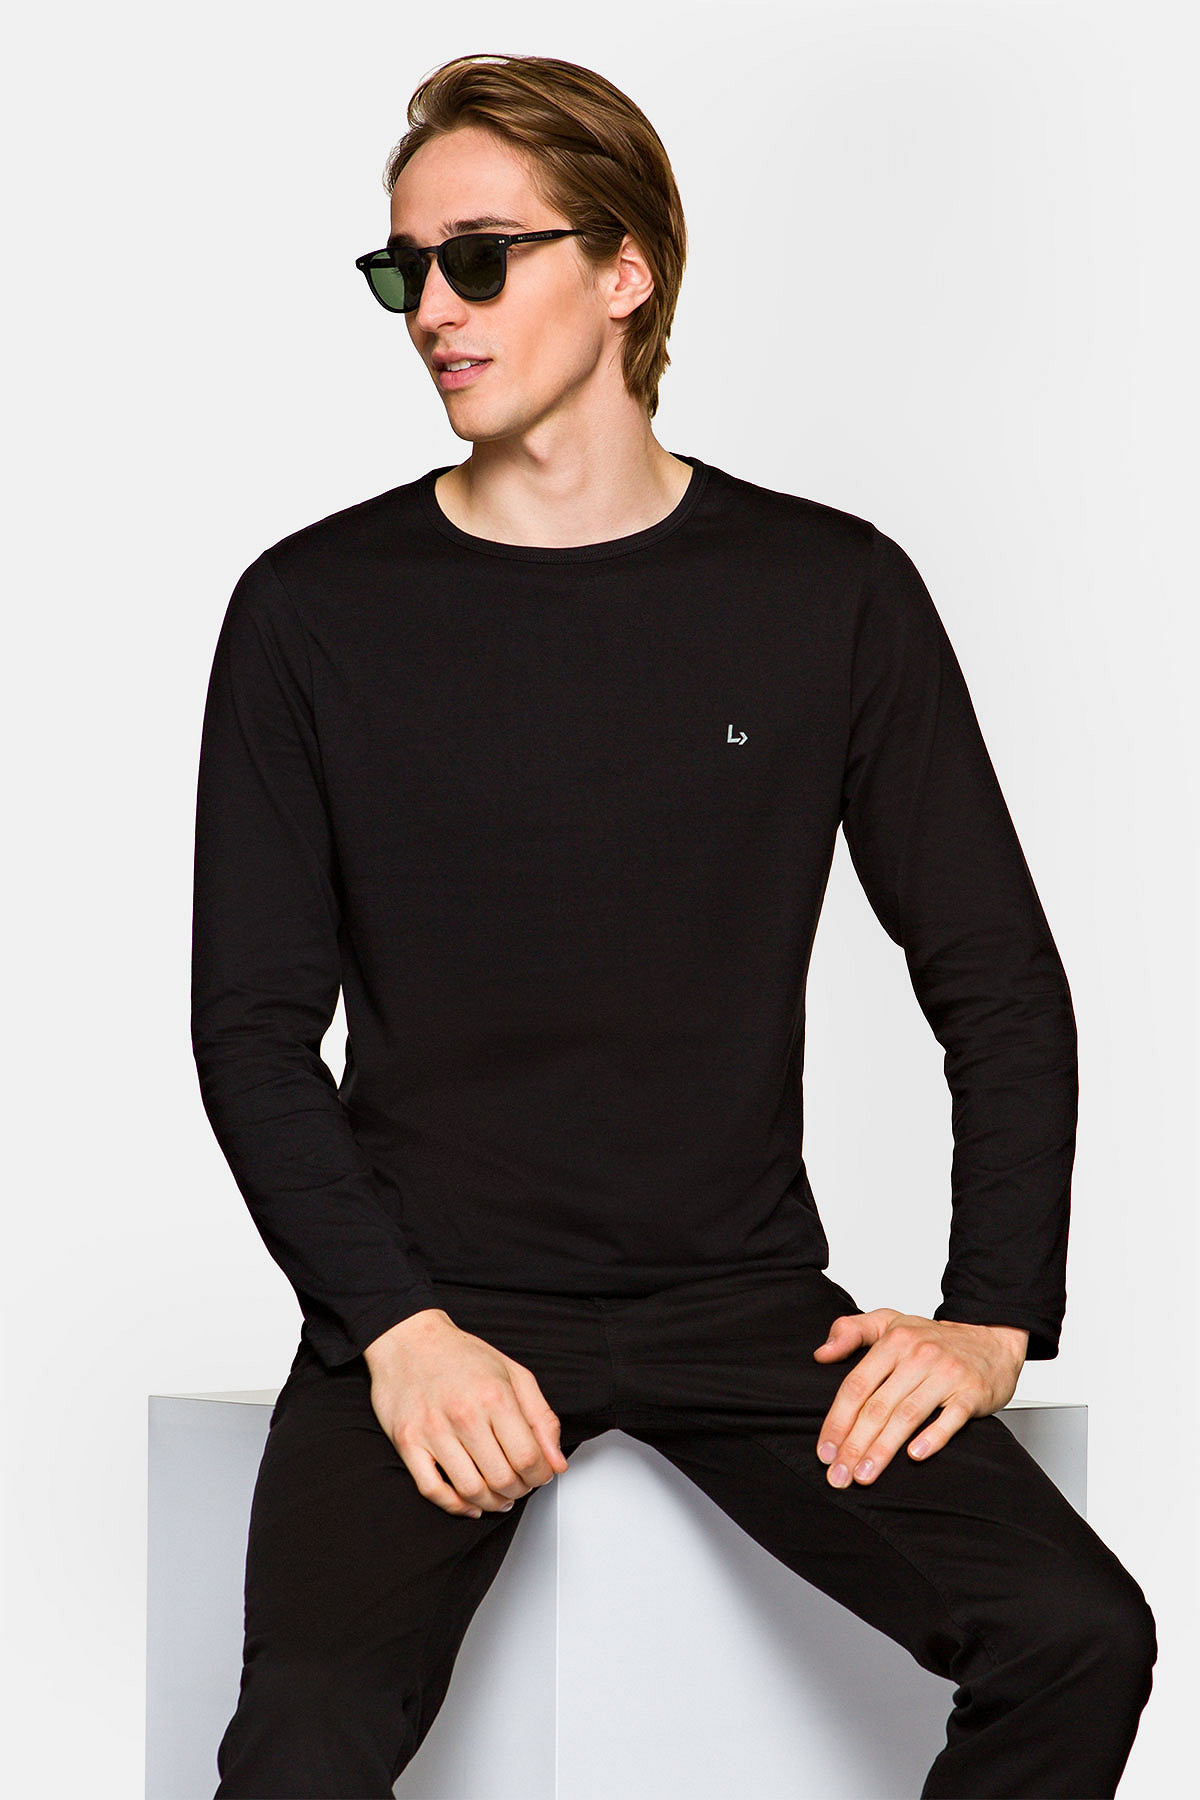 Koszulka z Długim Rękawem Czarna Runcorn rozmiar 2XL; 3XL; L; M; XL